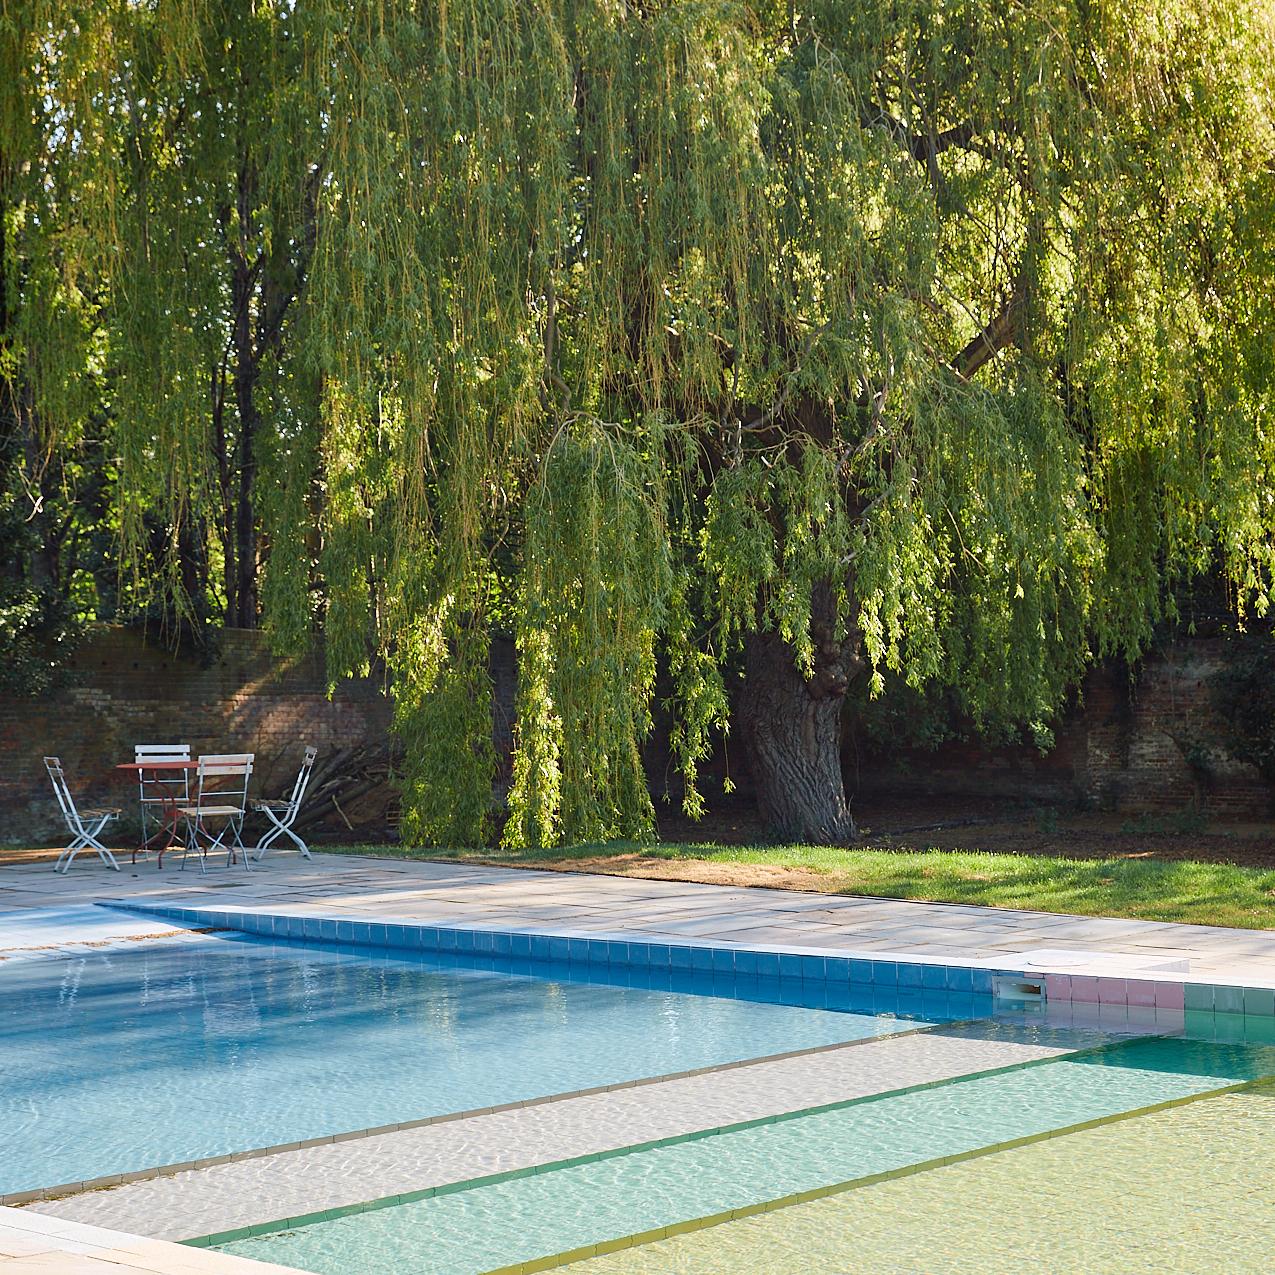 Lido willows